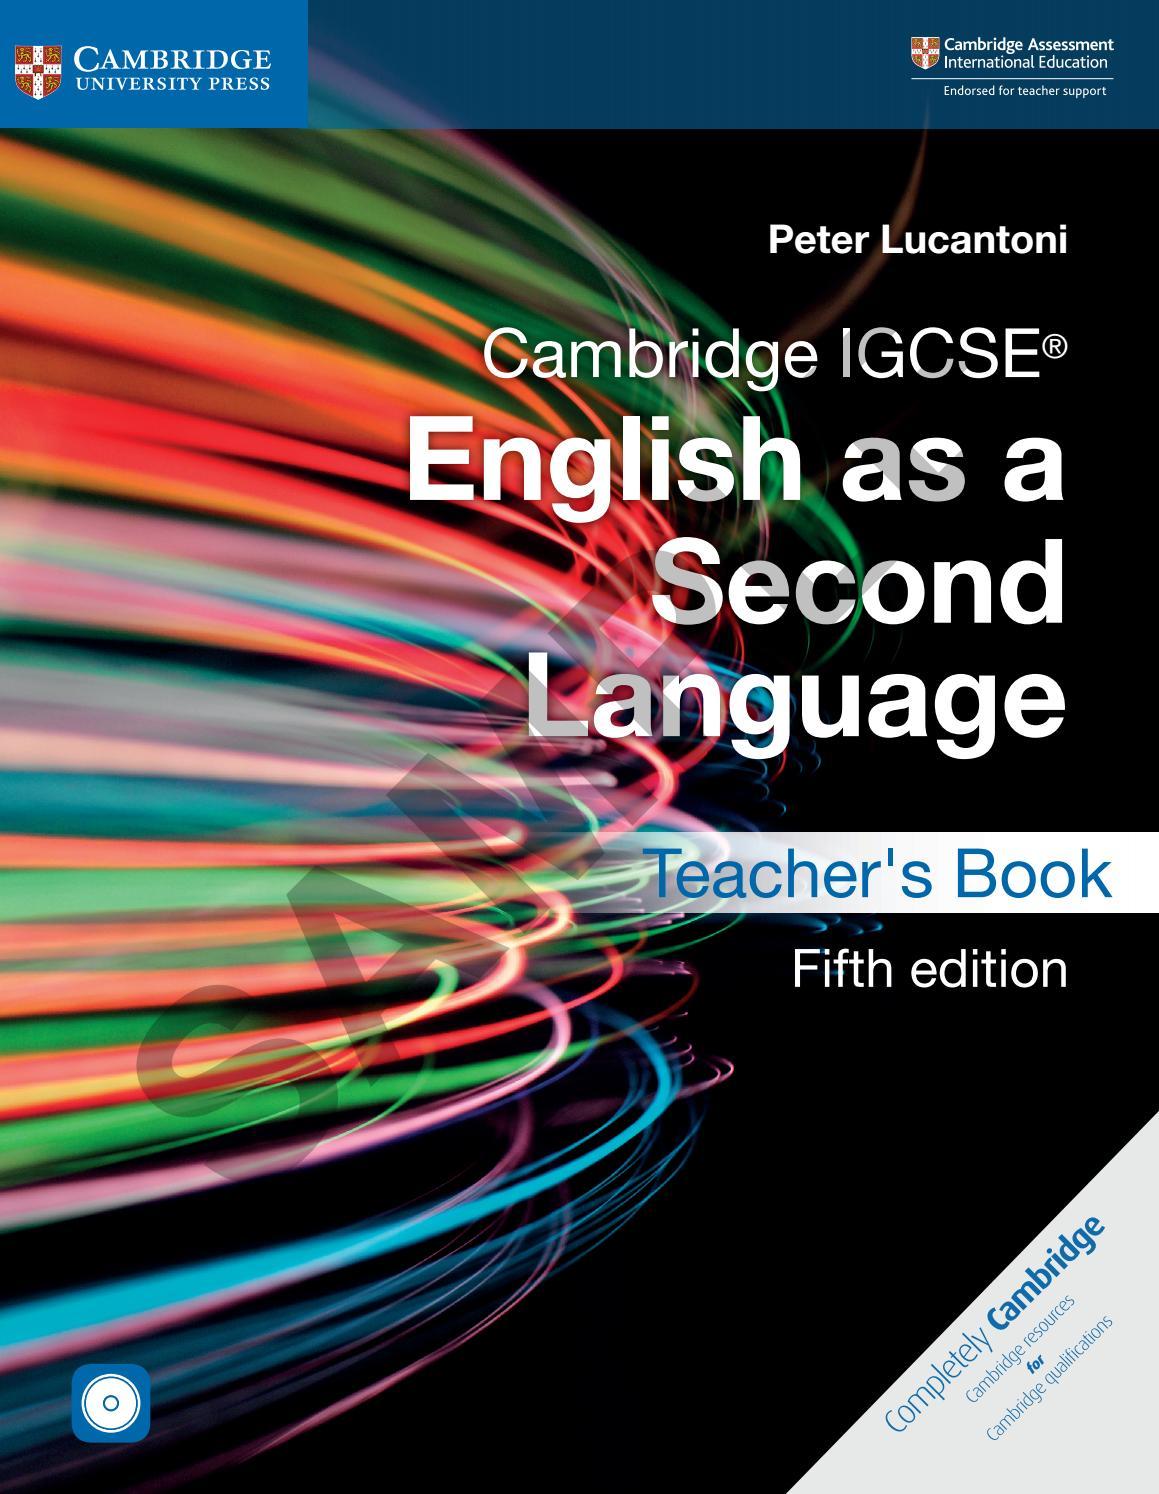 hight resolution of Cambridge IGCSE English as a Second Language Teacher's Resources by  Cambridge University Press Education - issuu